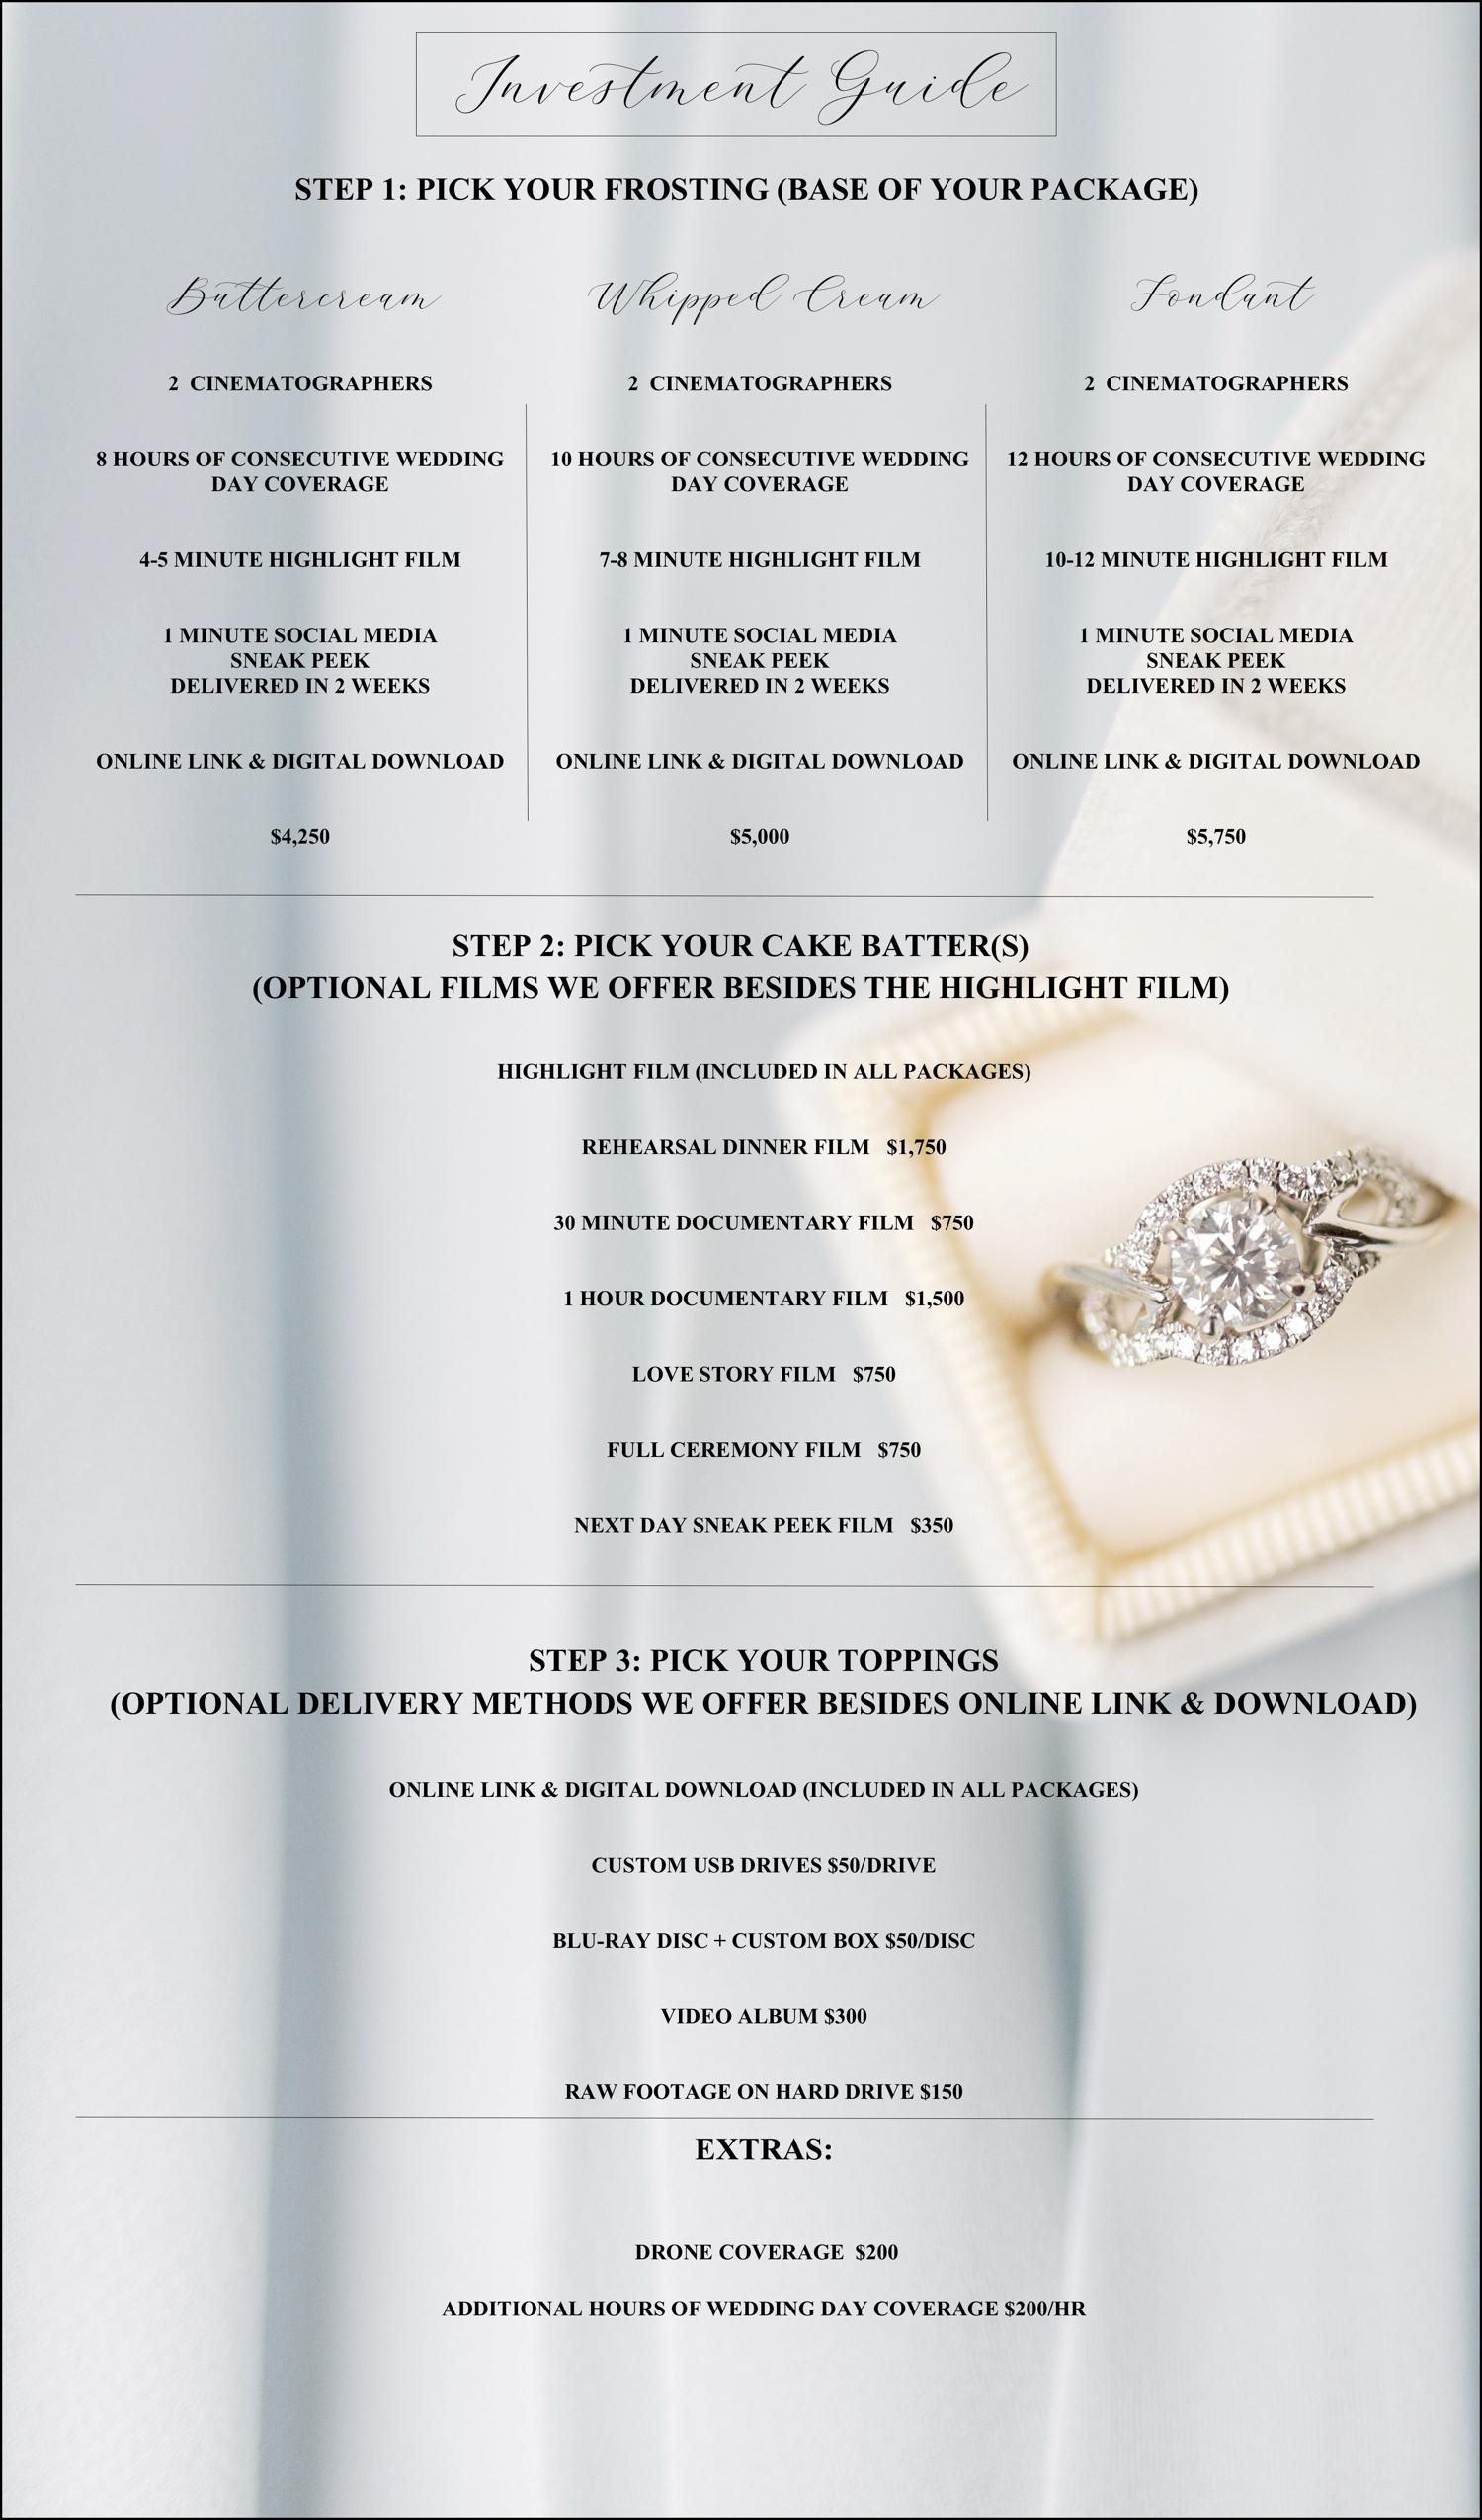 Investment Guide 2019-2020.jpg